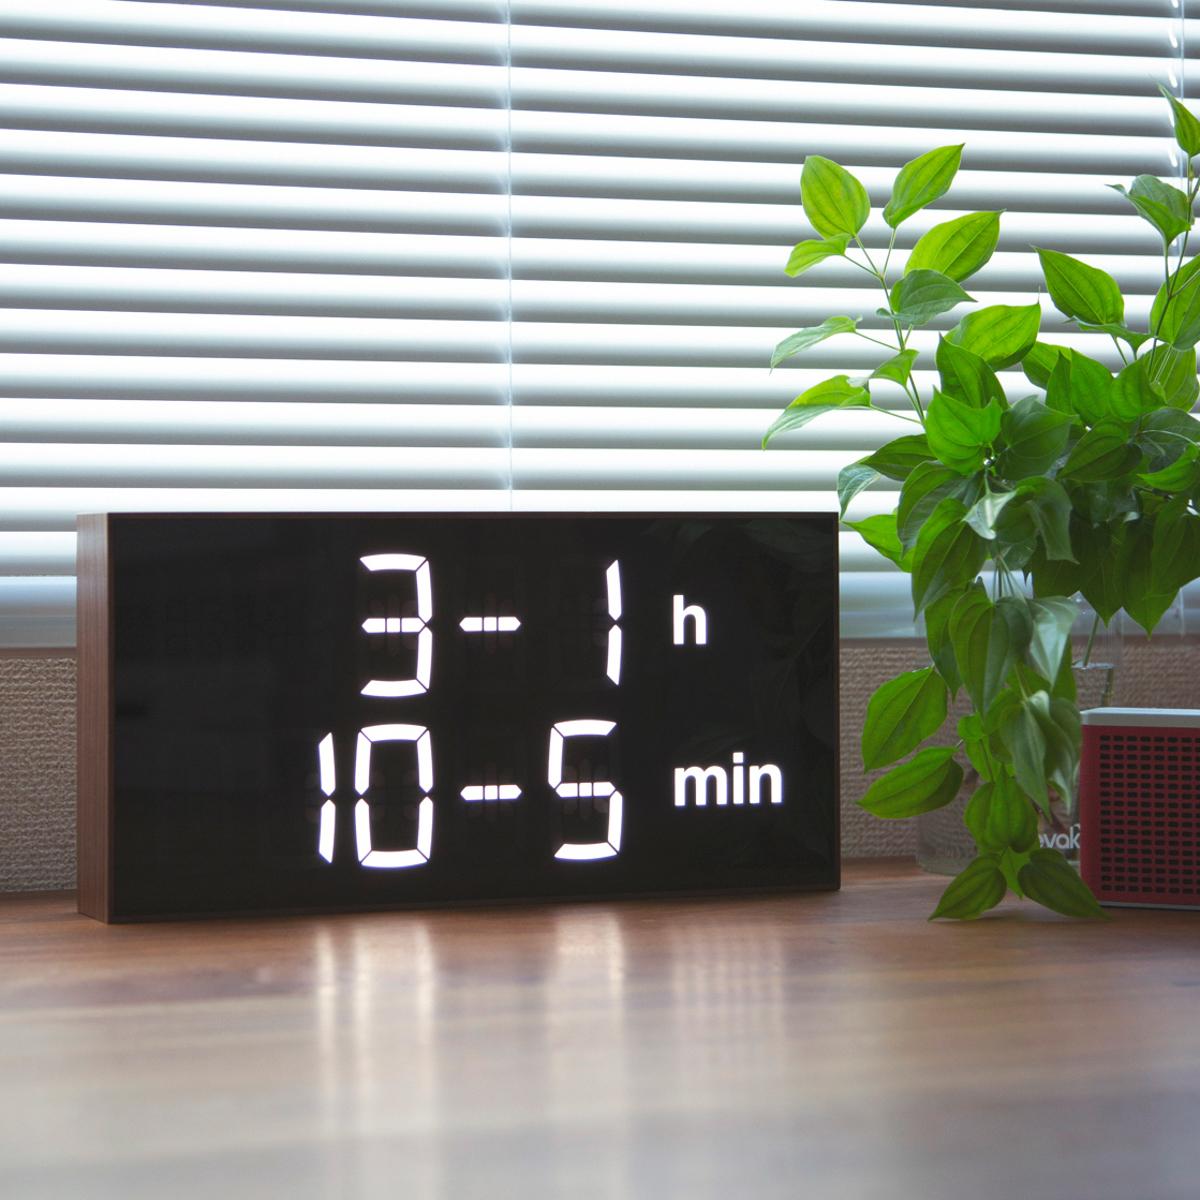 『4+2×7h:62-4min』、いま何時?(笑) ゲーム感覚で数式を解いて、時刻を割り出す時計